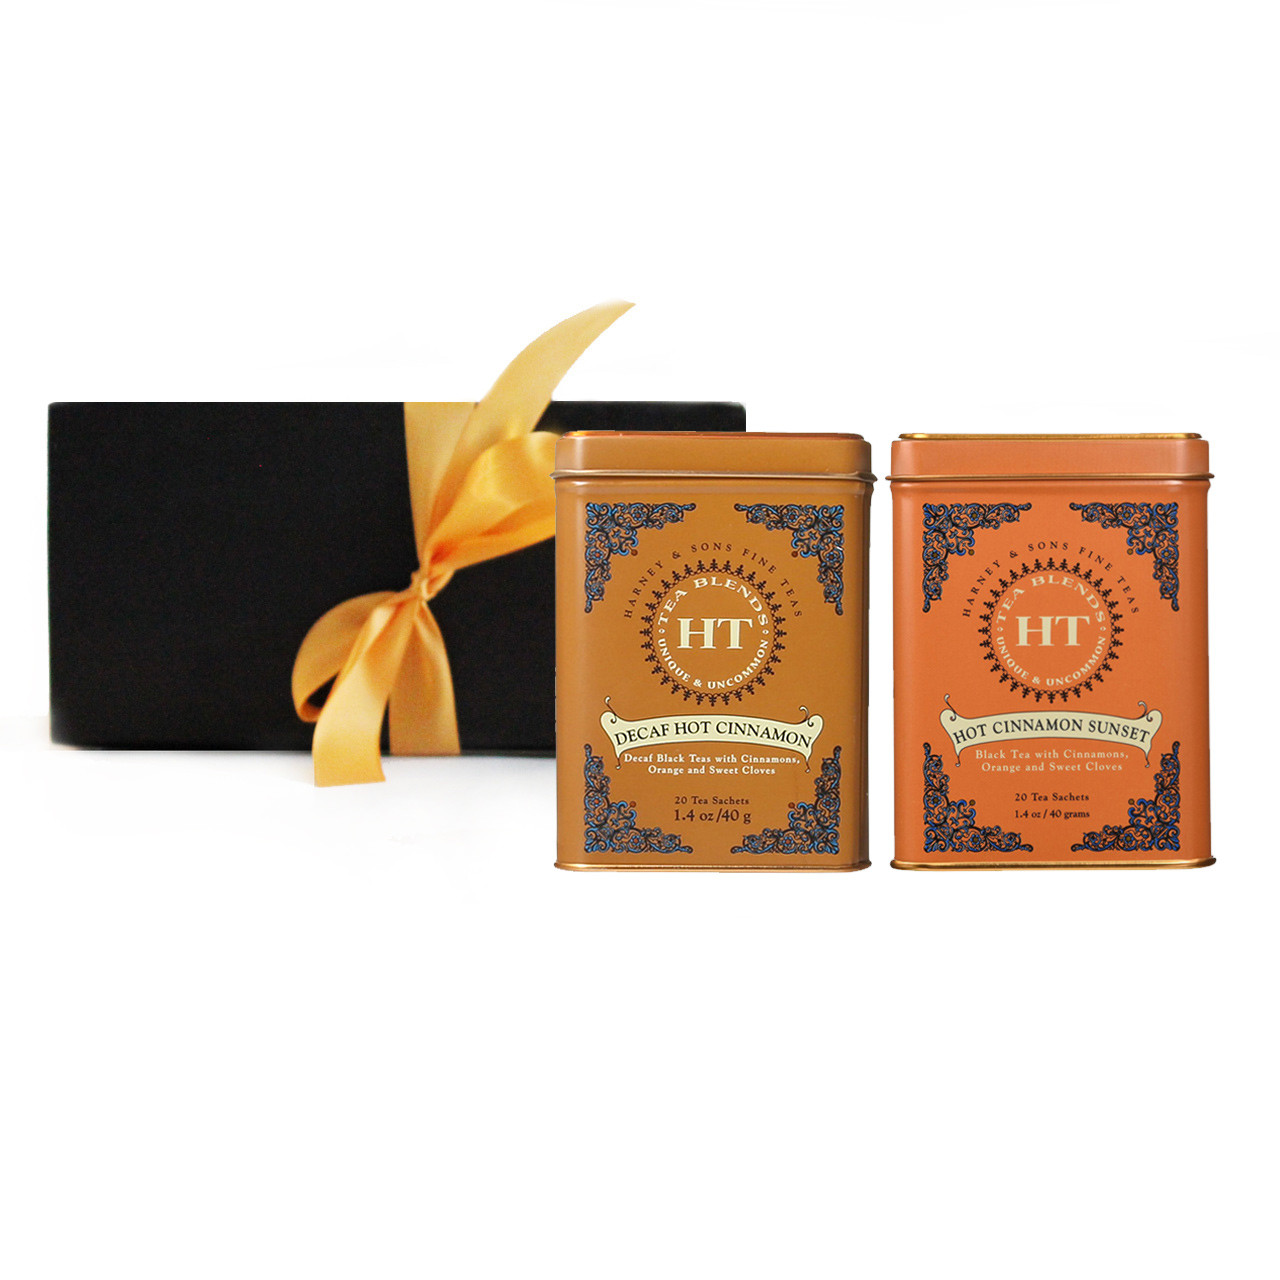 Harney Sons Hot Cinnamon Sunset Tea Gift Set Premium Teas